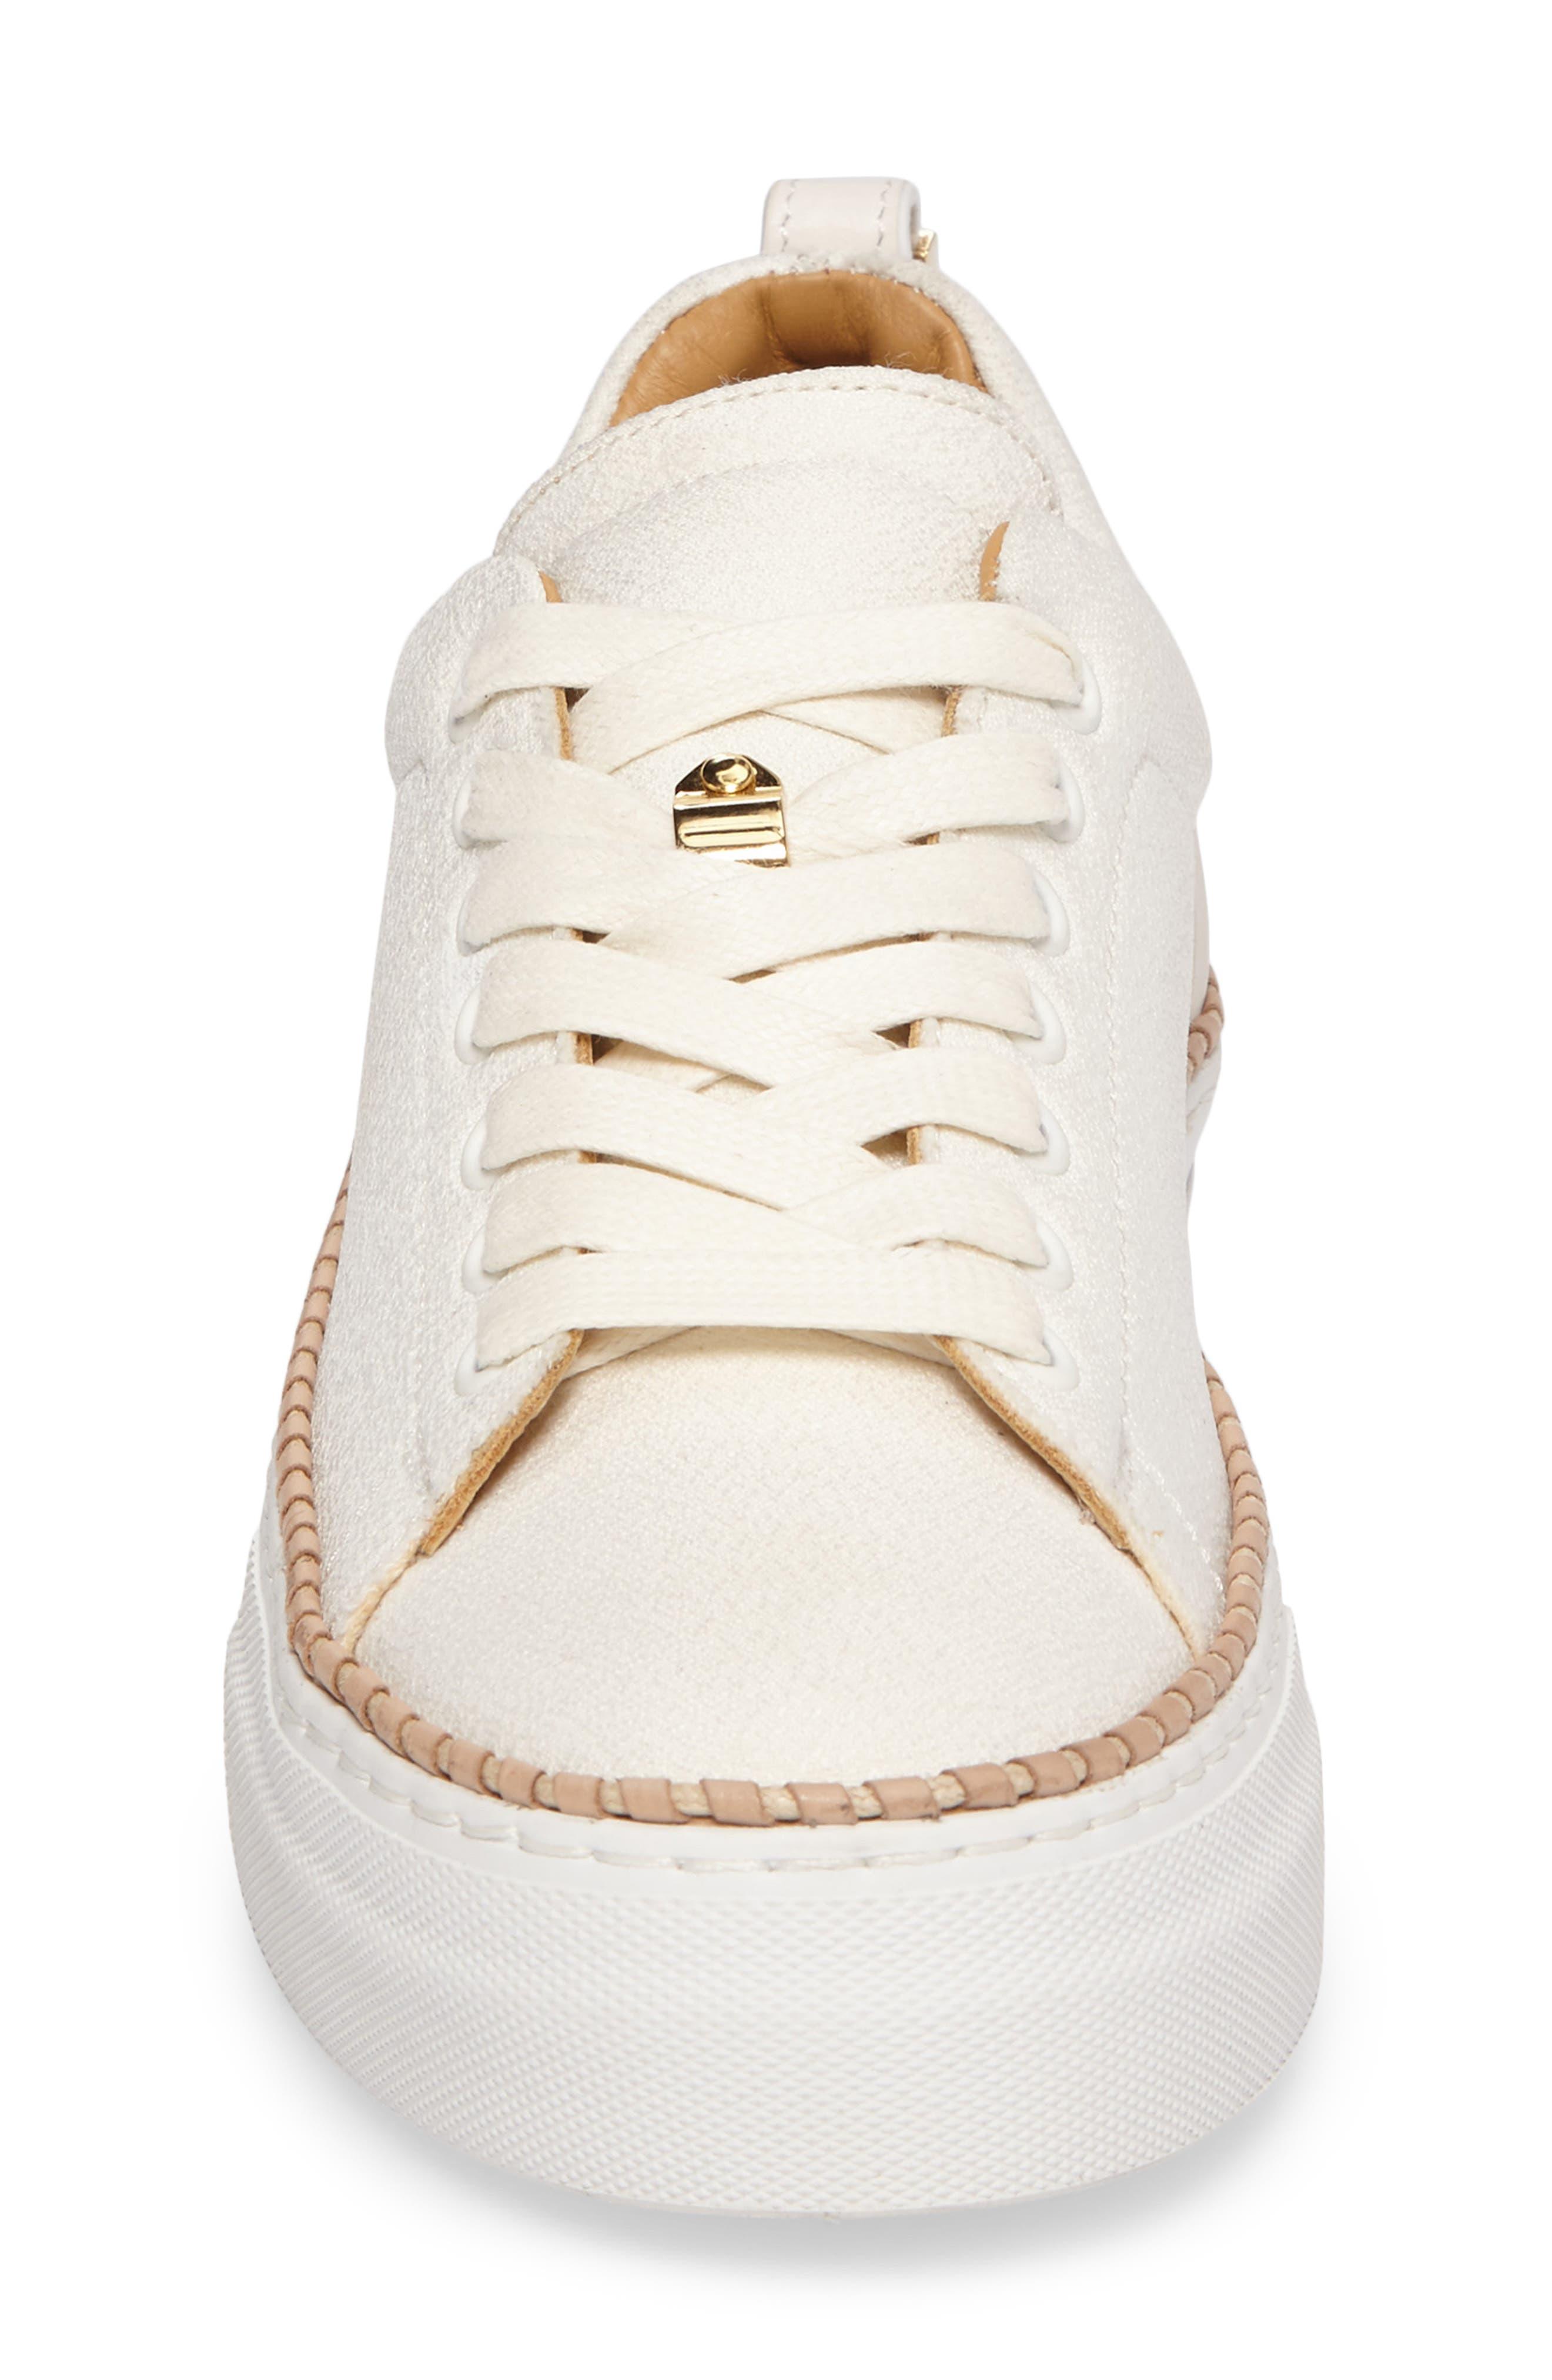 Tennis Crepone Sneaker,                             Alternate thumbnail 4, color,                             900